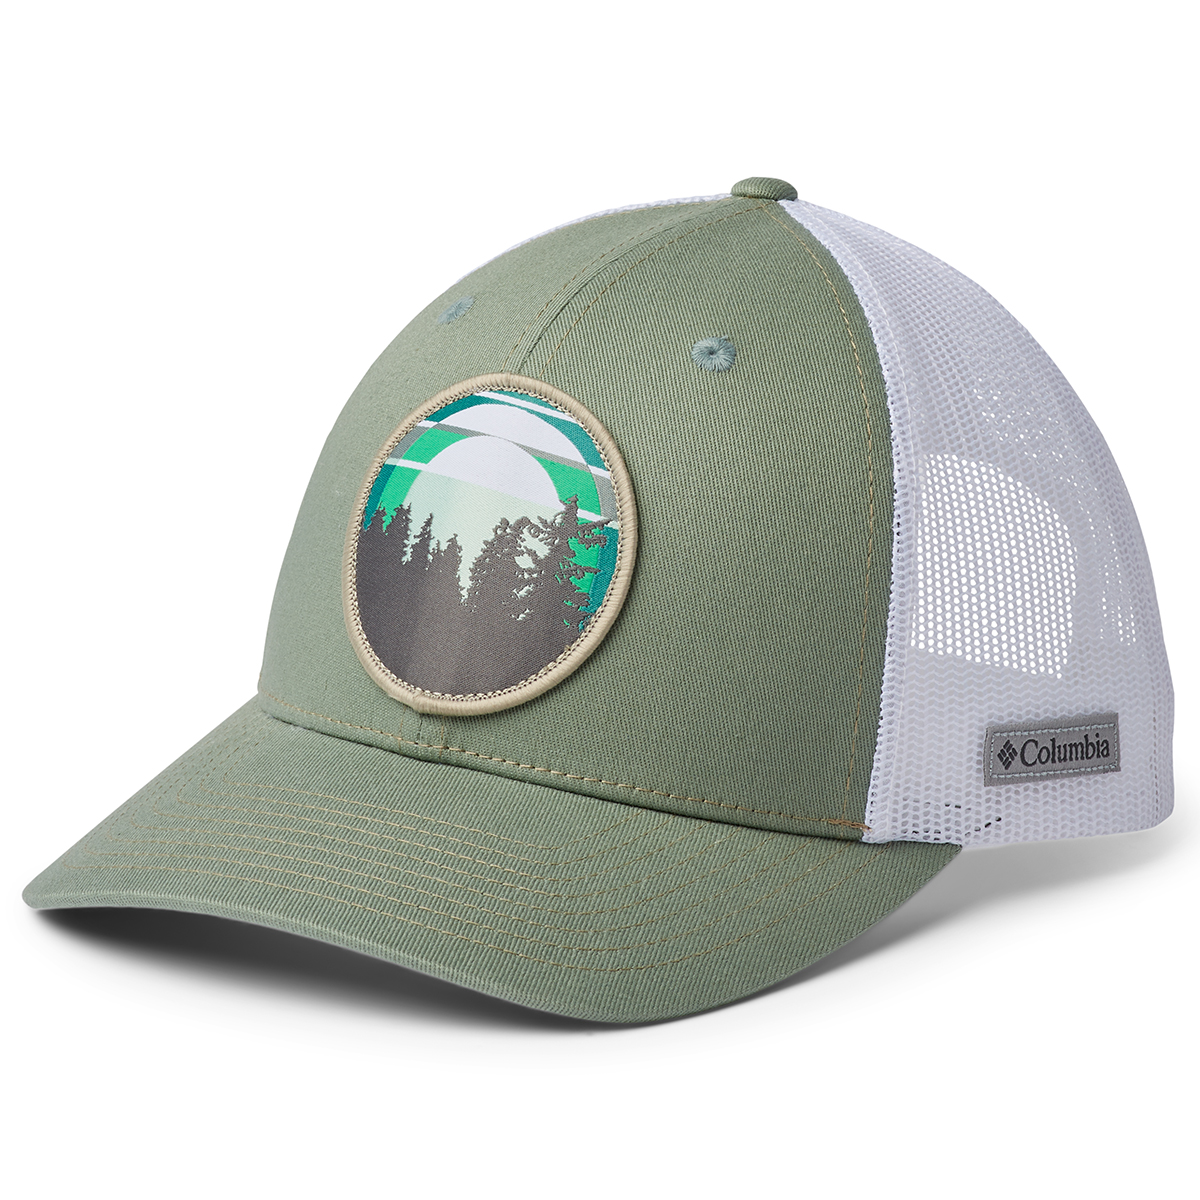 Columbia Women's Snap Back Hat - Green, ONESIZE